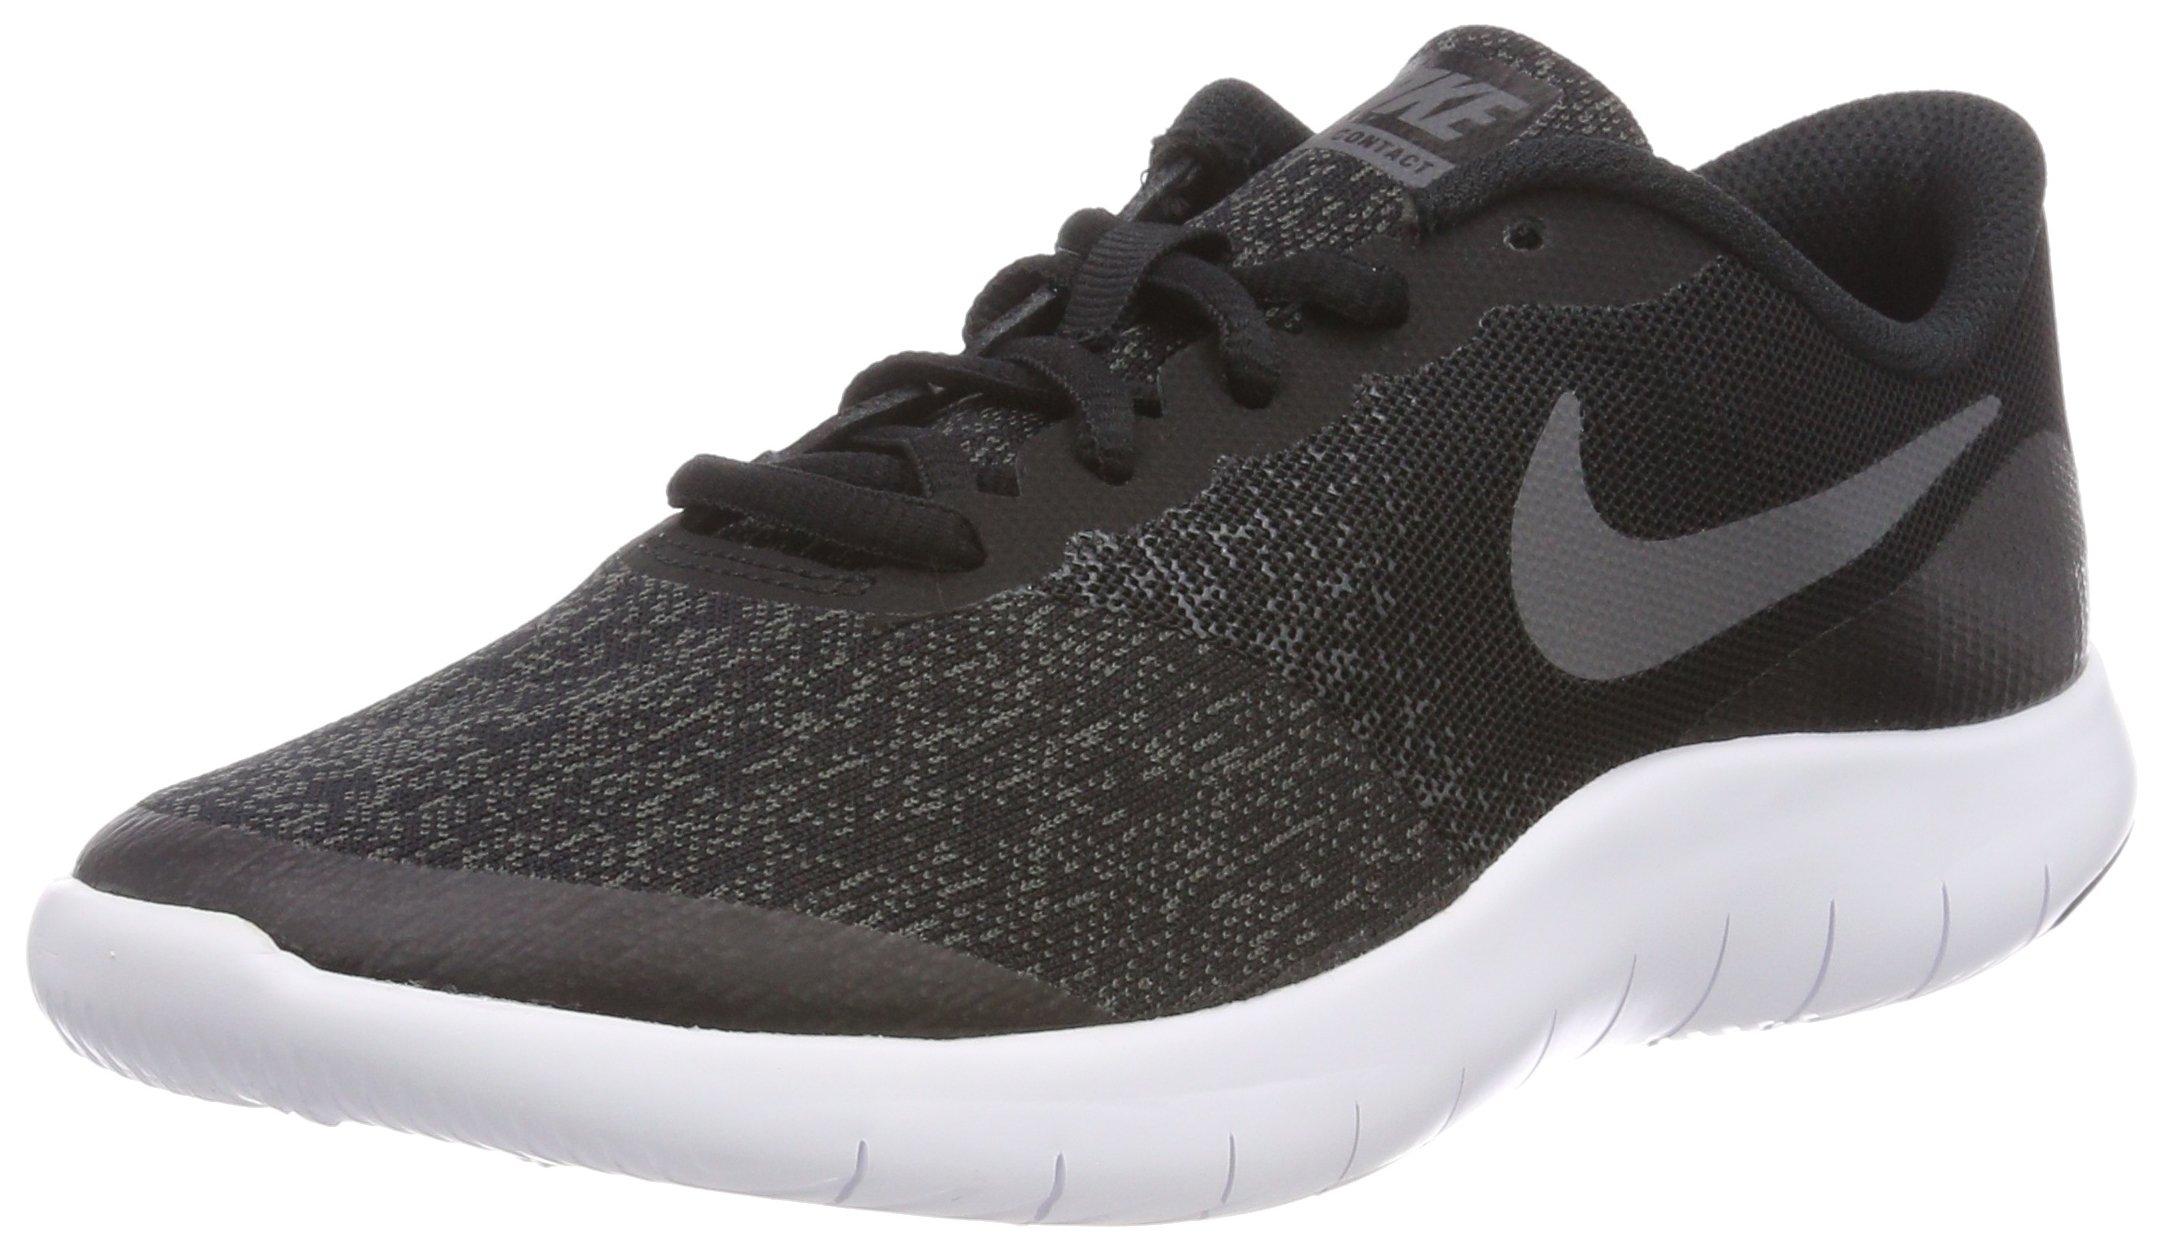 Nike Kids Flex Contact (GS) Black/Dark Grey/Anthracite Running Shoe 5 Kids US by Nike